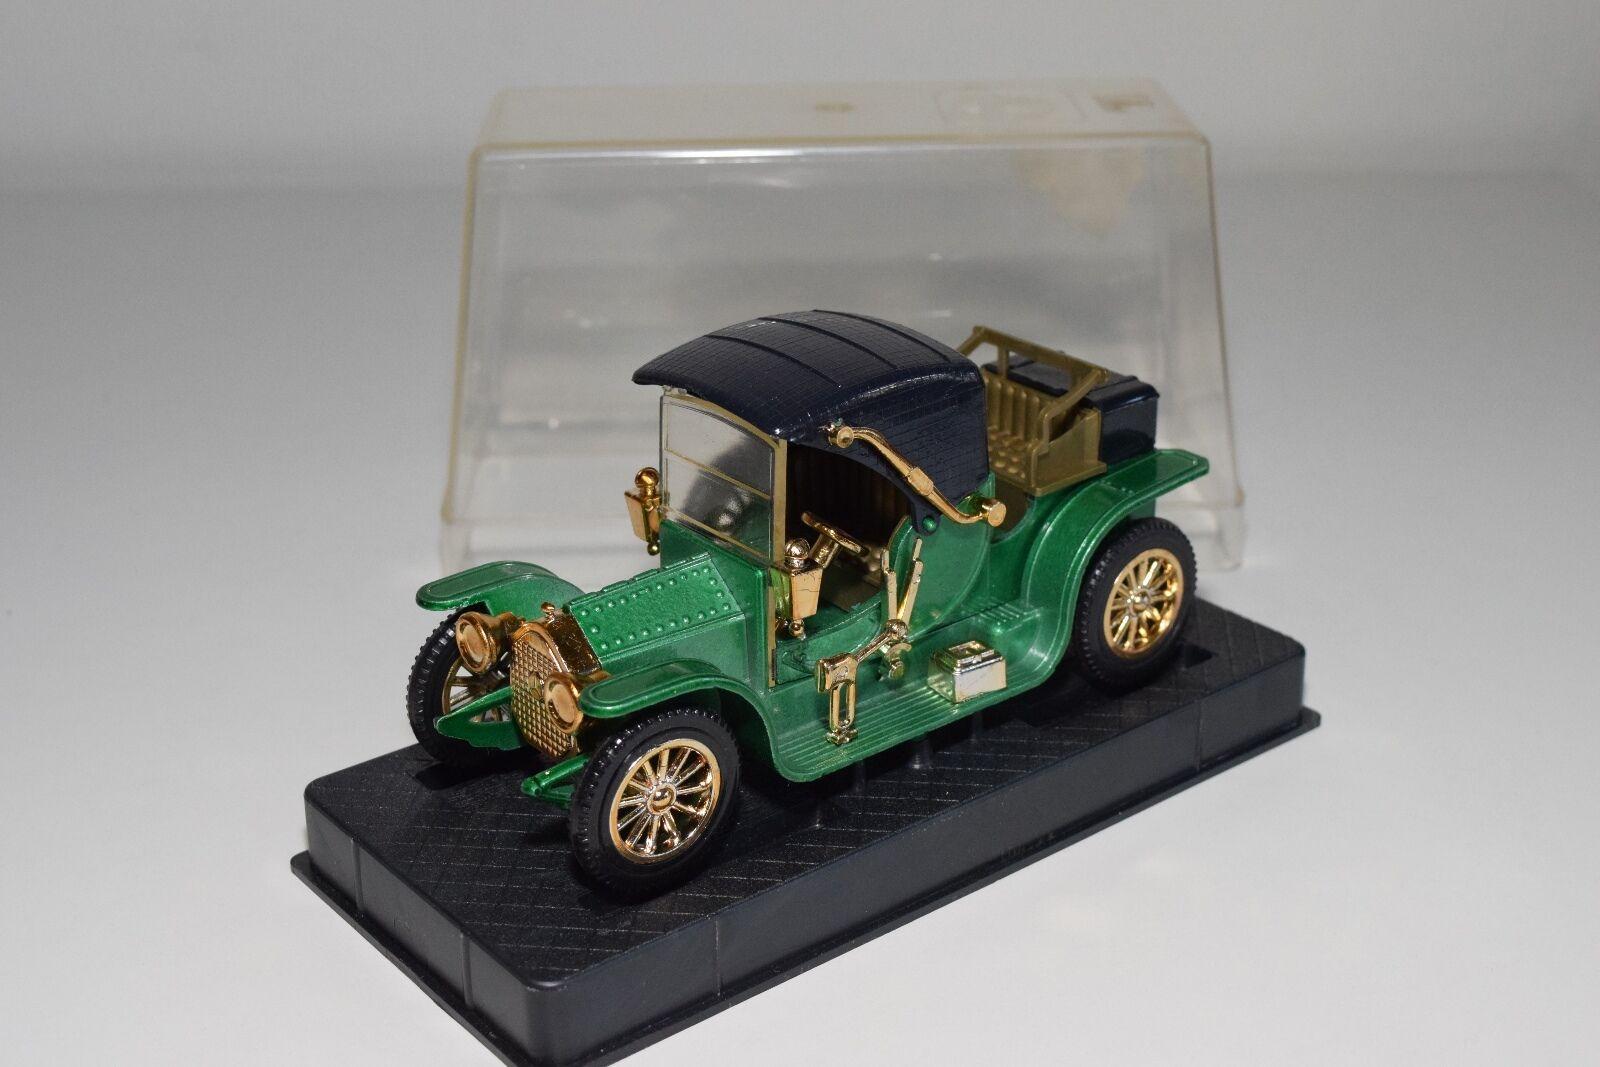 + NACORAL 3808 MERCEDES BENZ 1905 METALLIC vert MINT BOXED RARE SELTEN